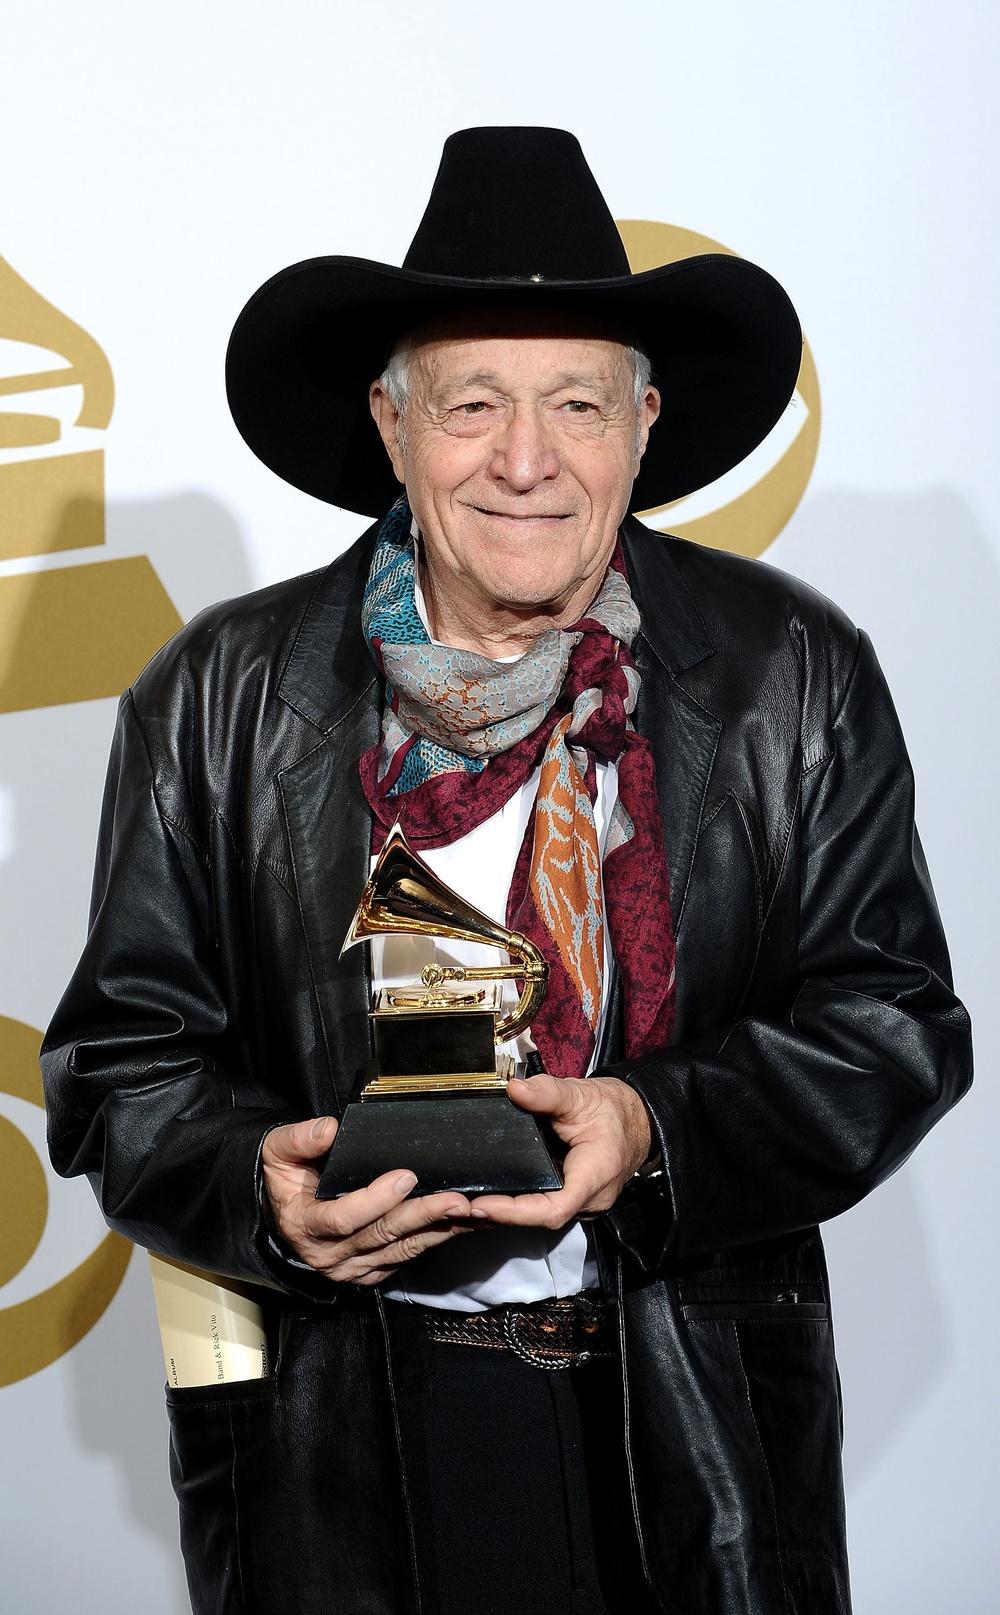 RJE Grammy 2010 300dpi.jpeg